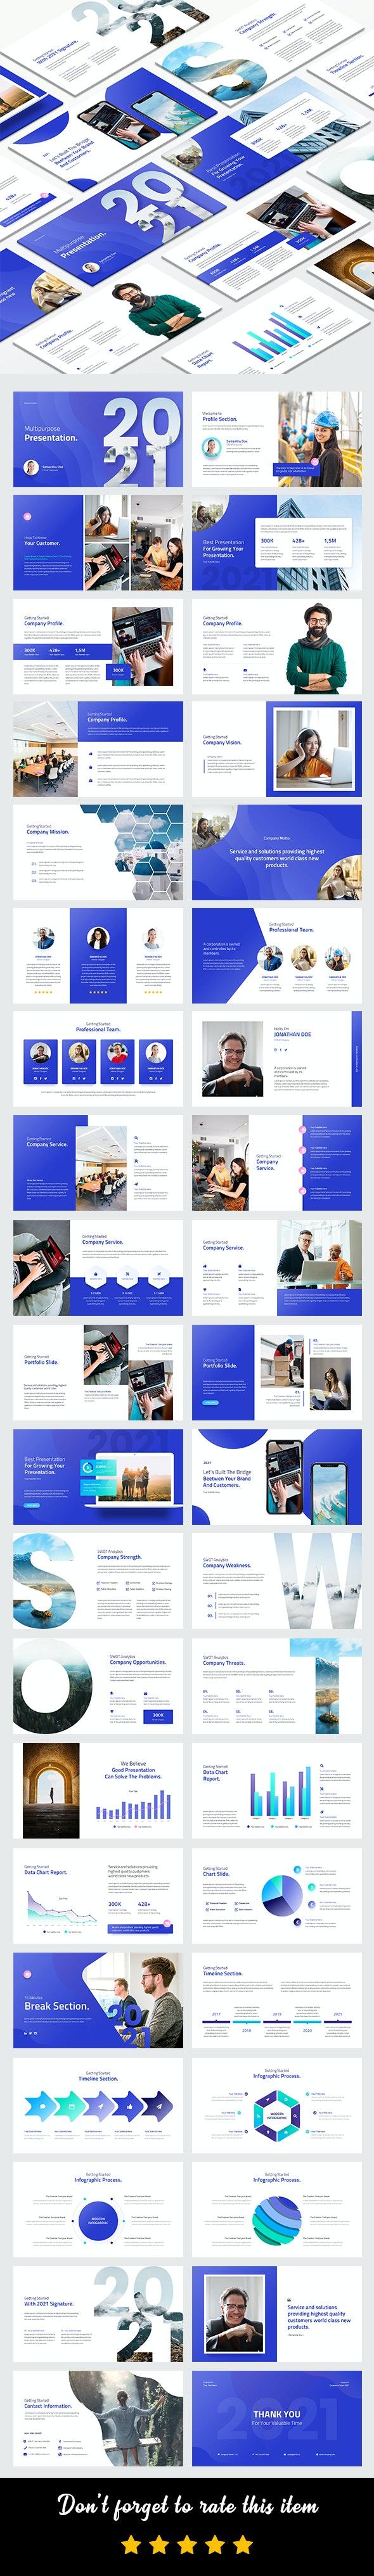 2021 Creative Multipurpose Google Slides Template - Google Slides Presentation Templates